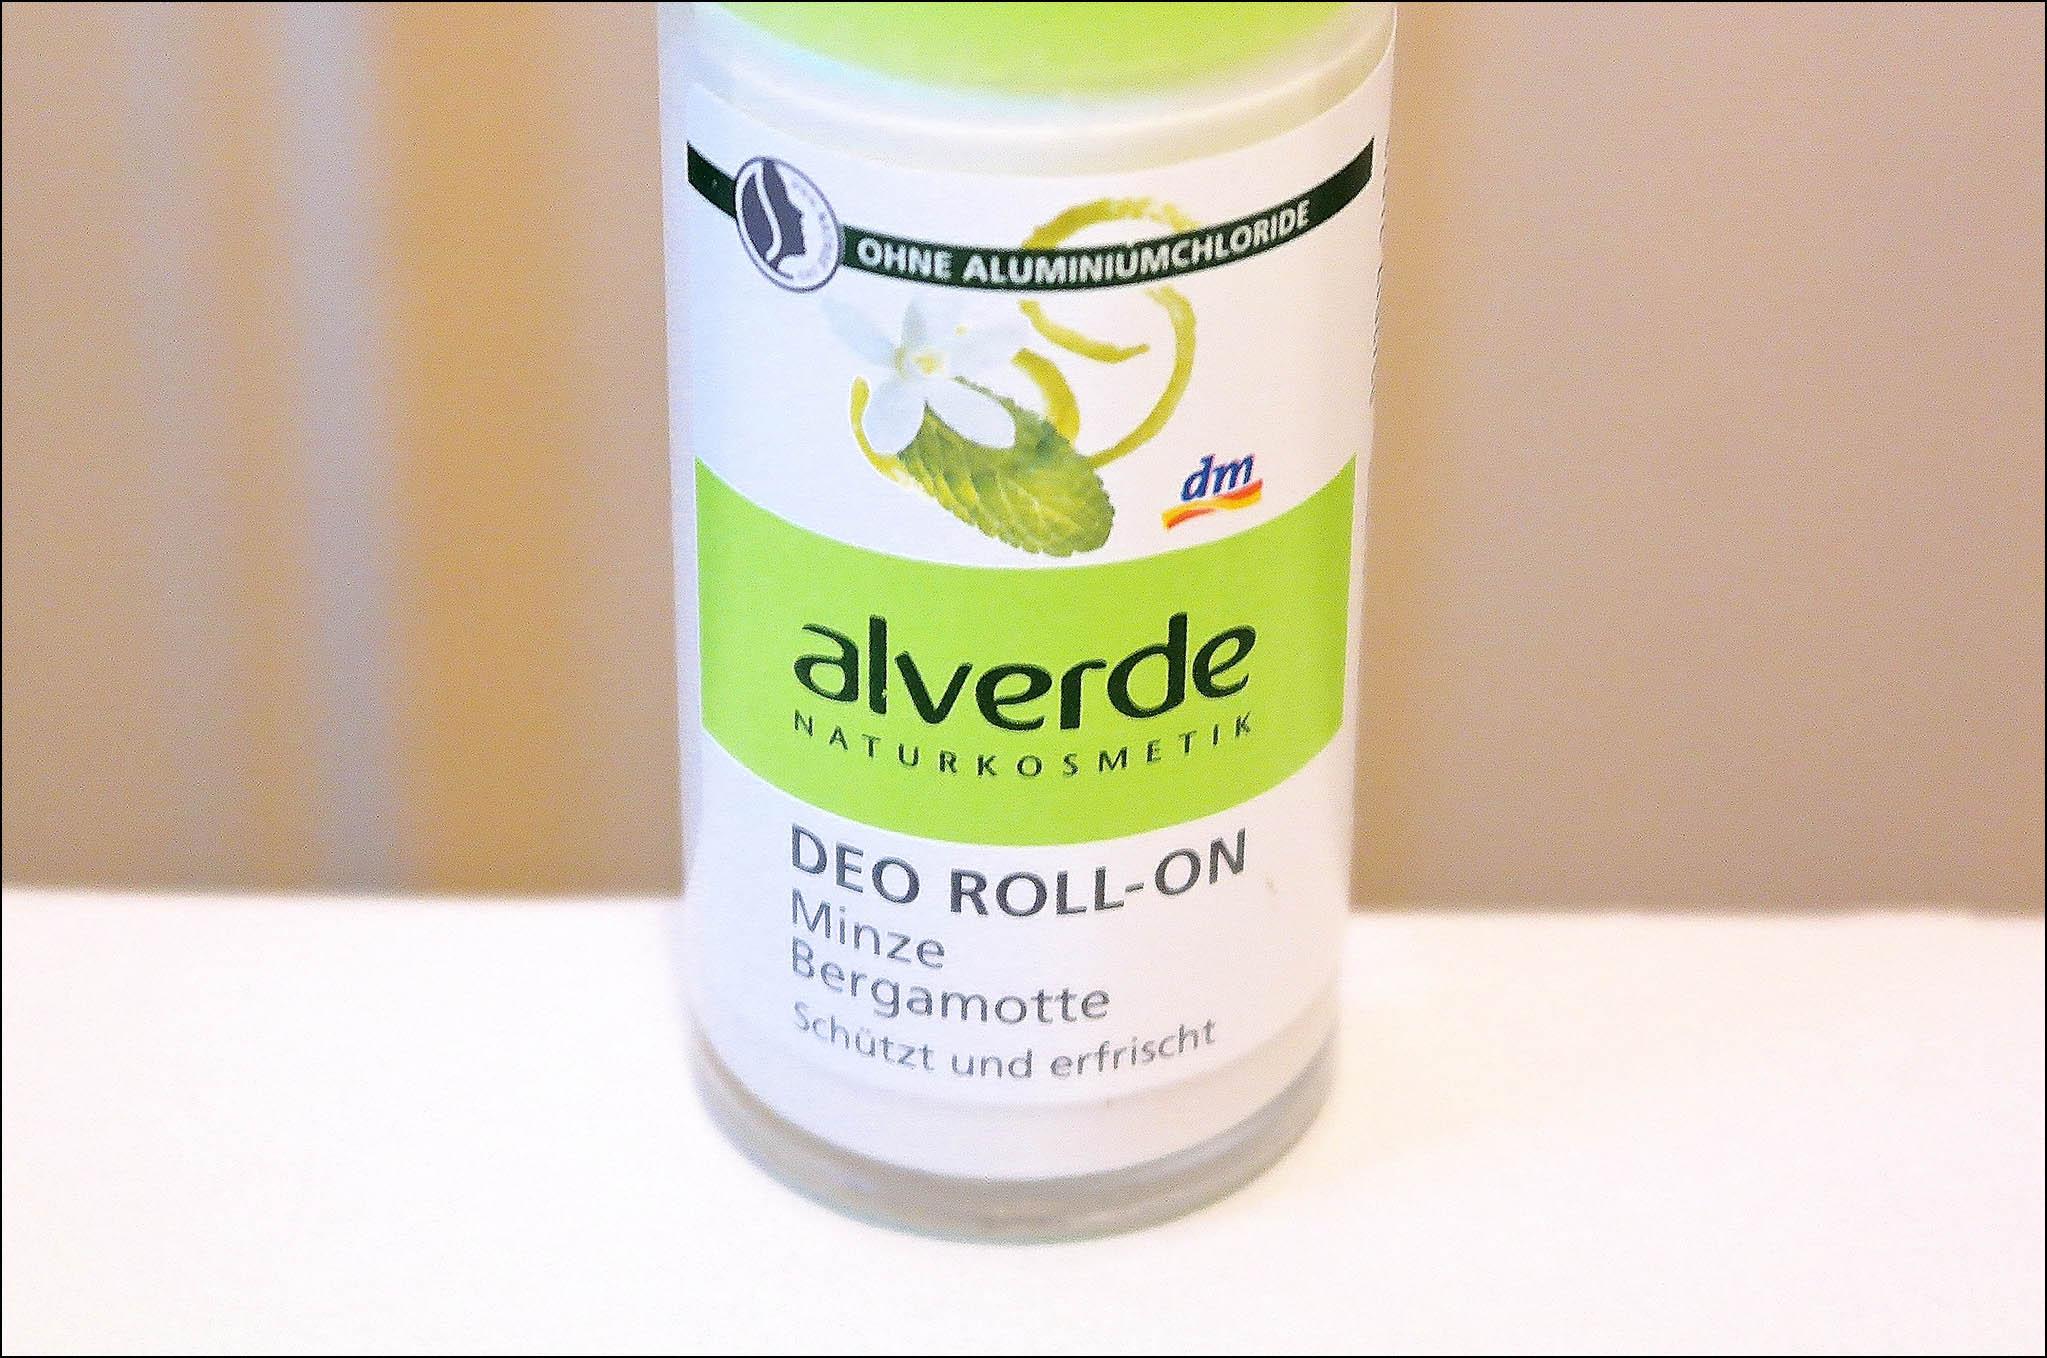 déodorant, alverde, menthe, bergamote, déodorant alverde, alverde deodorant